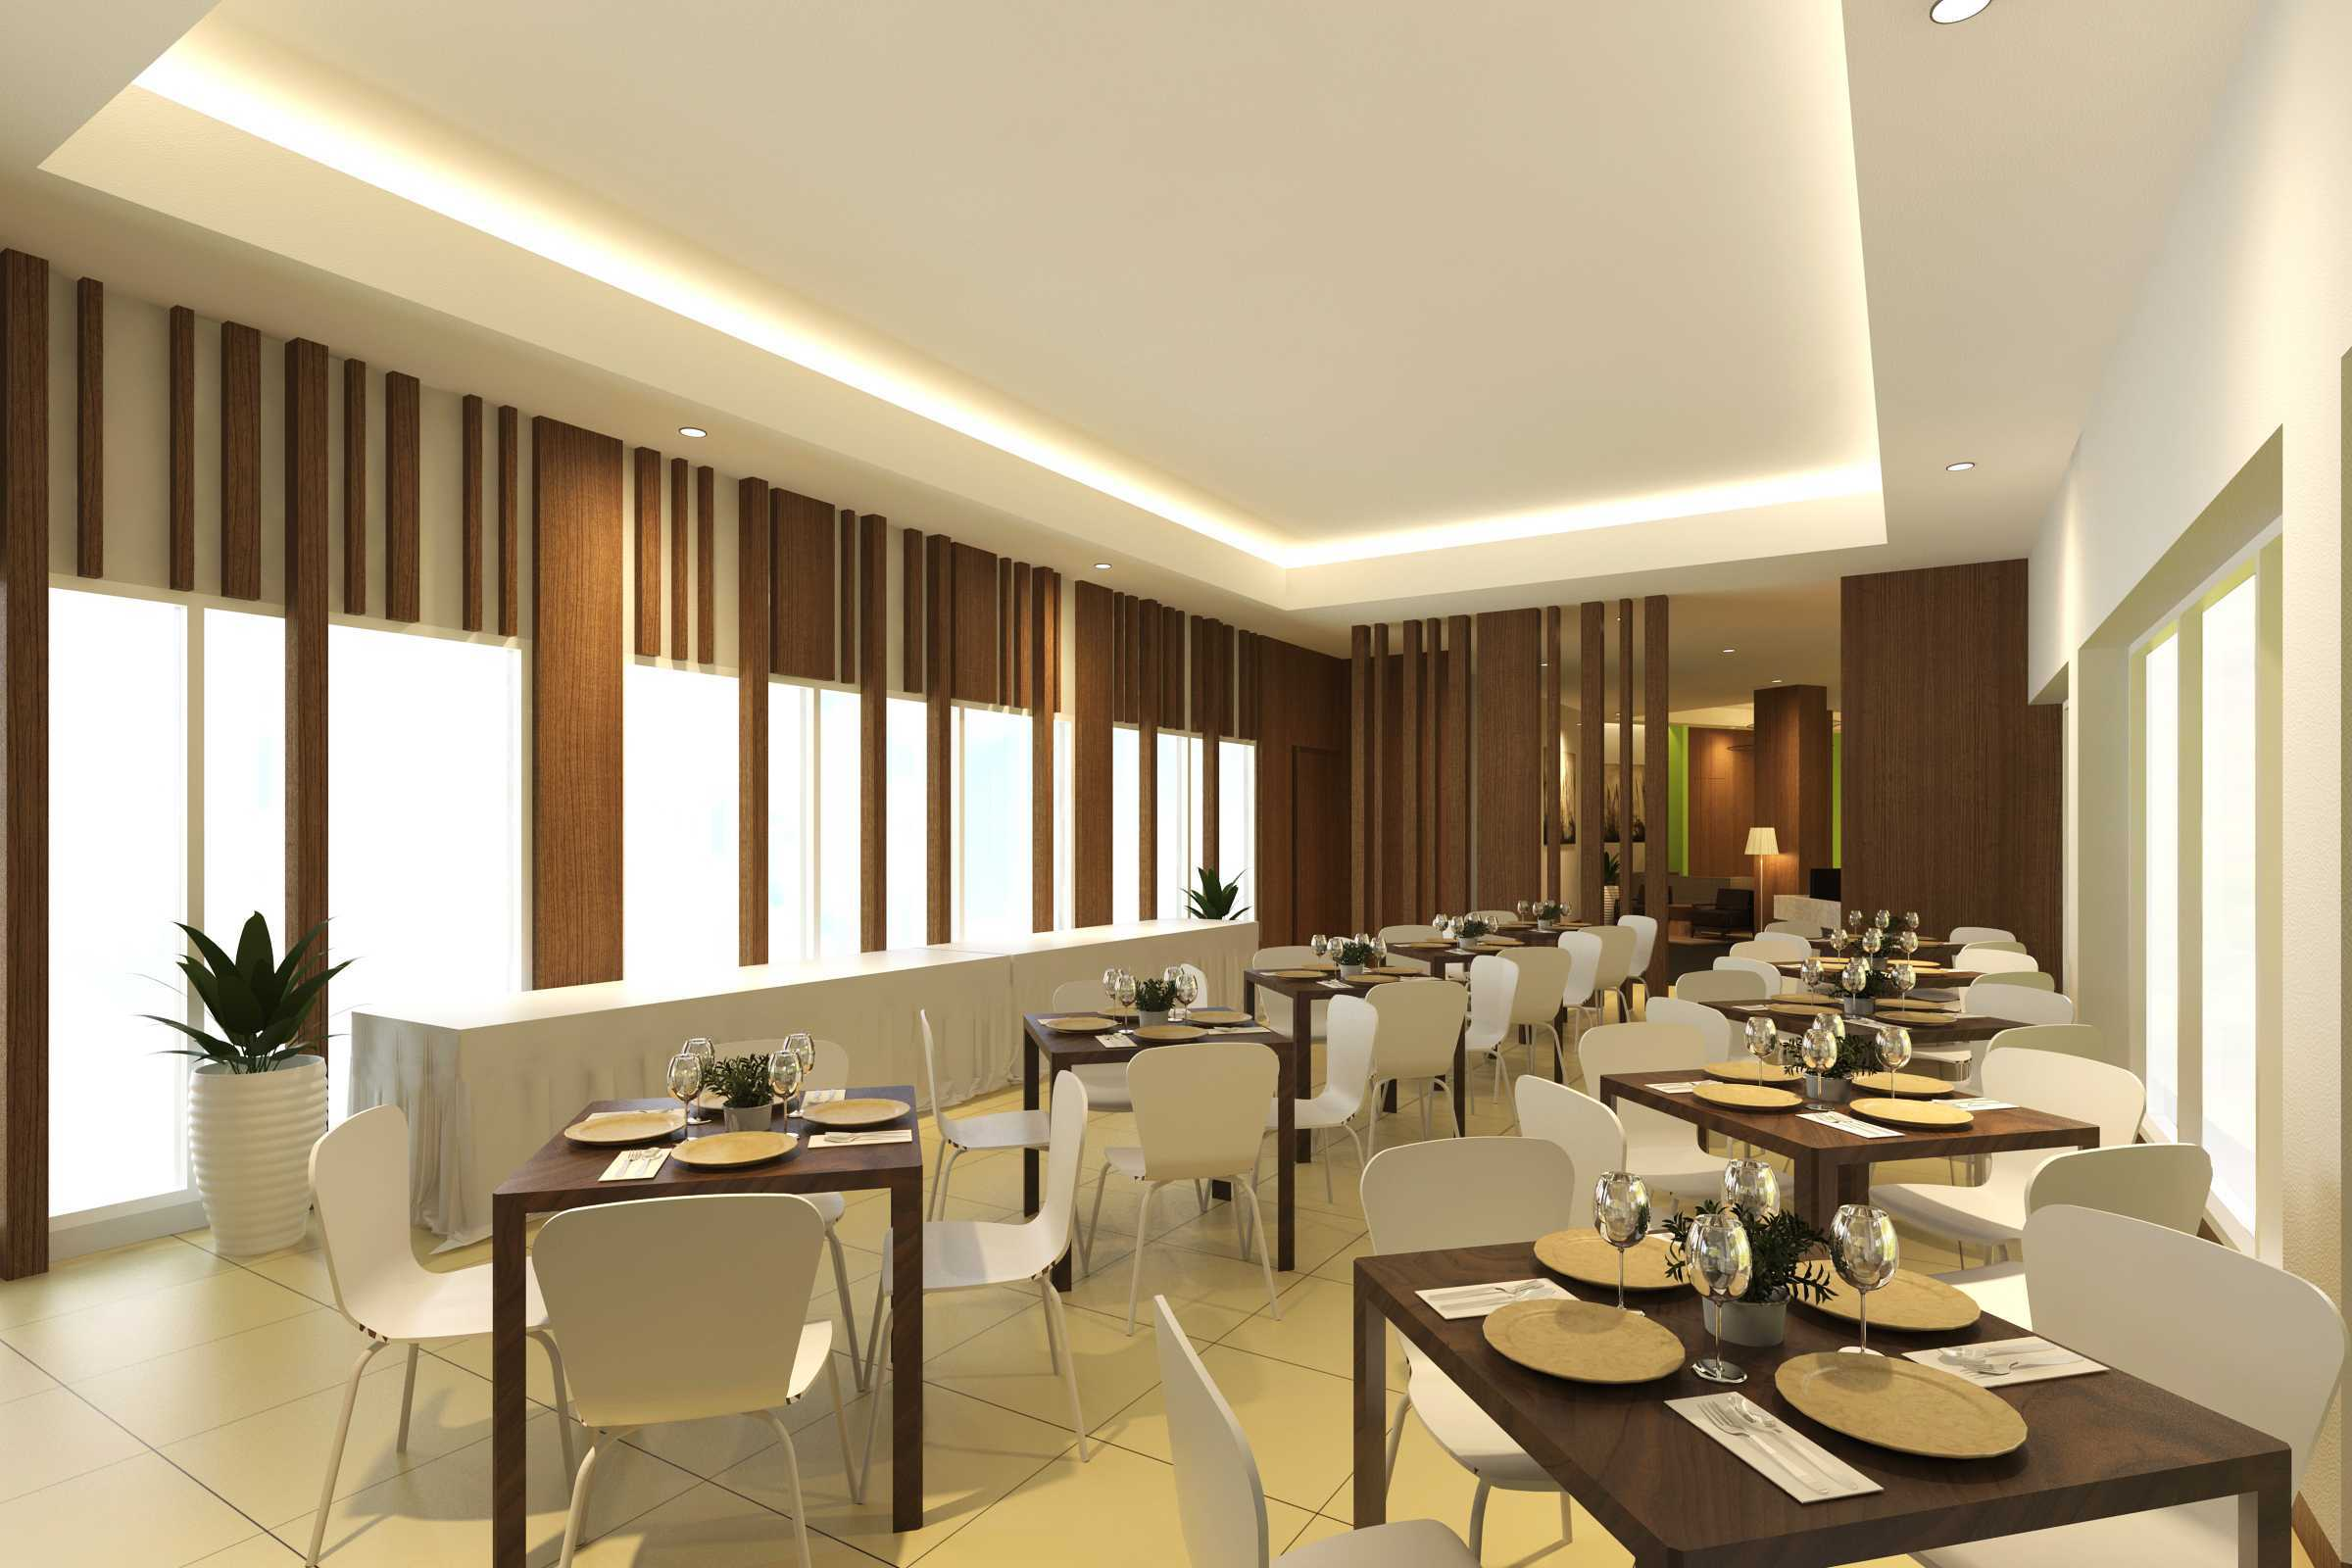 Pt. Modula Hotel Greenotel Cilegon, Kota Cilegon, Banten, Indonesia Cilegon, Kota Cilegon, Banten, Indonesia Restaurant Hotel   38216